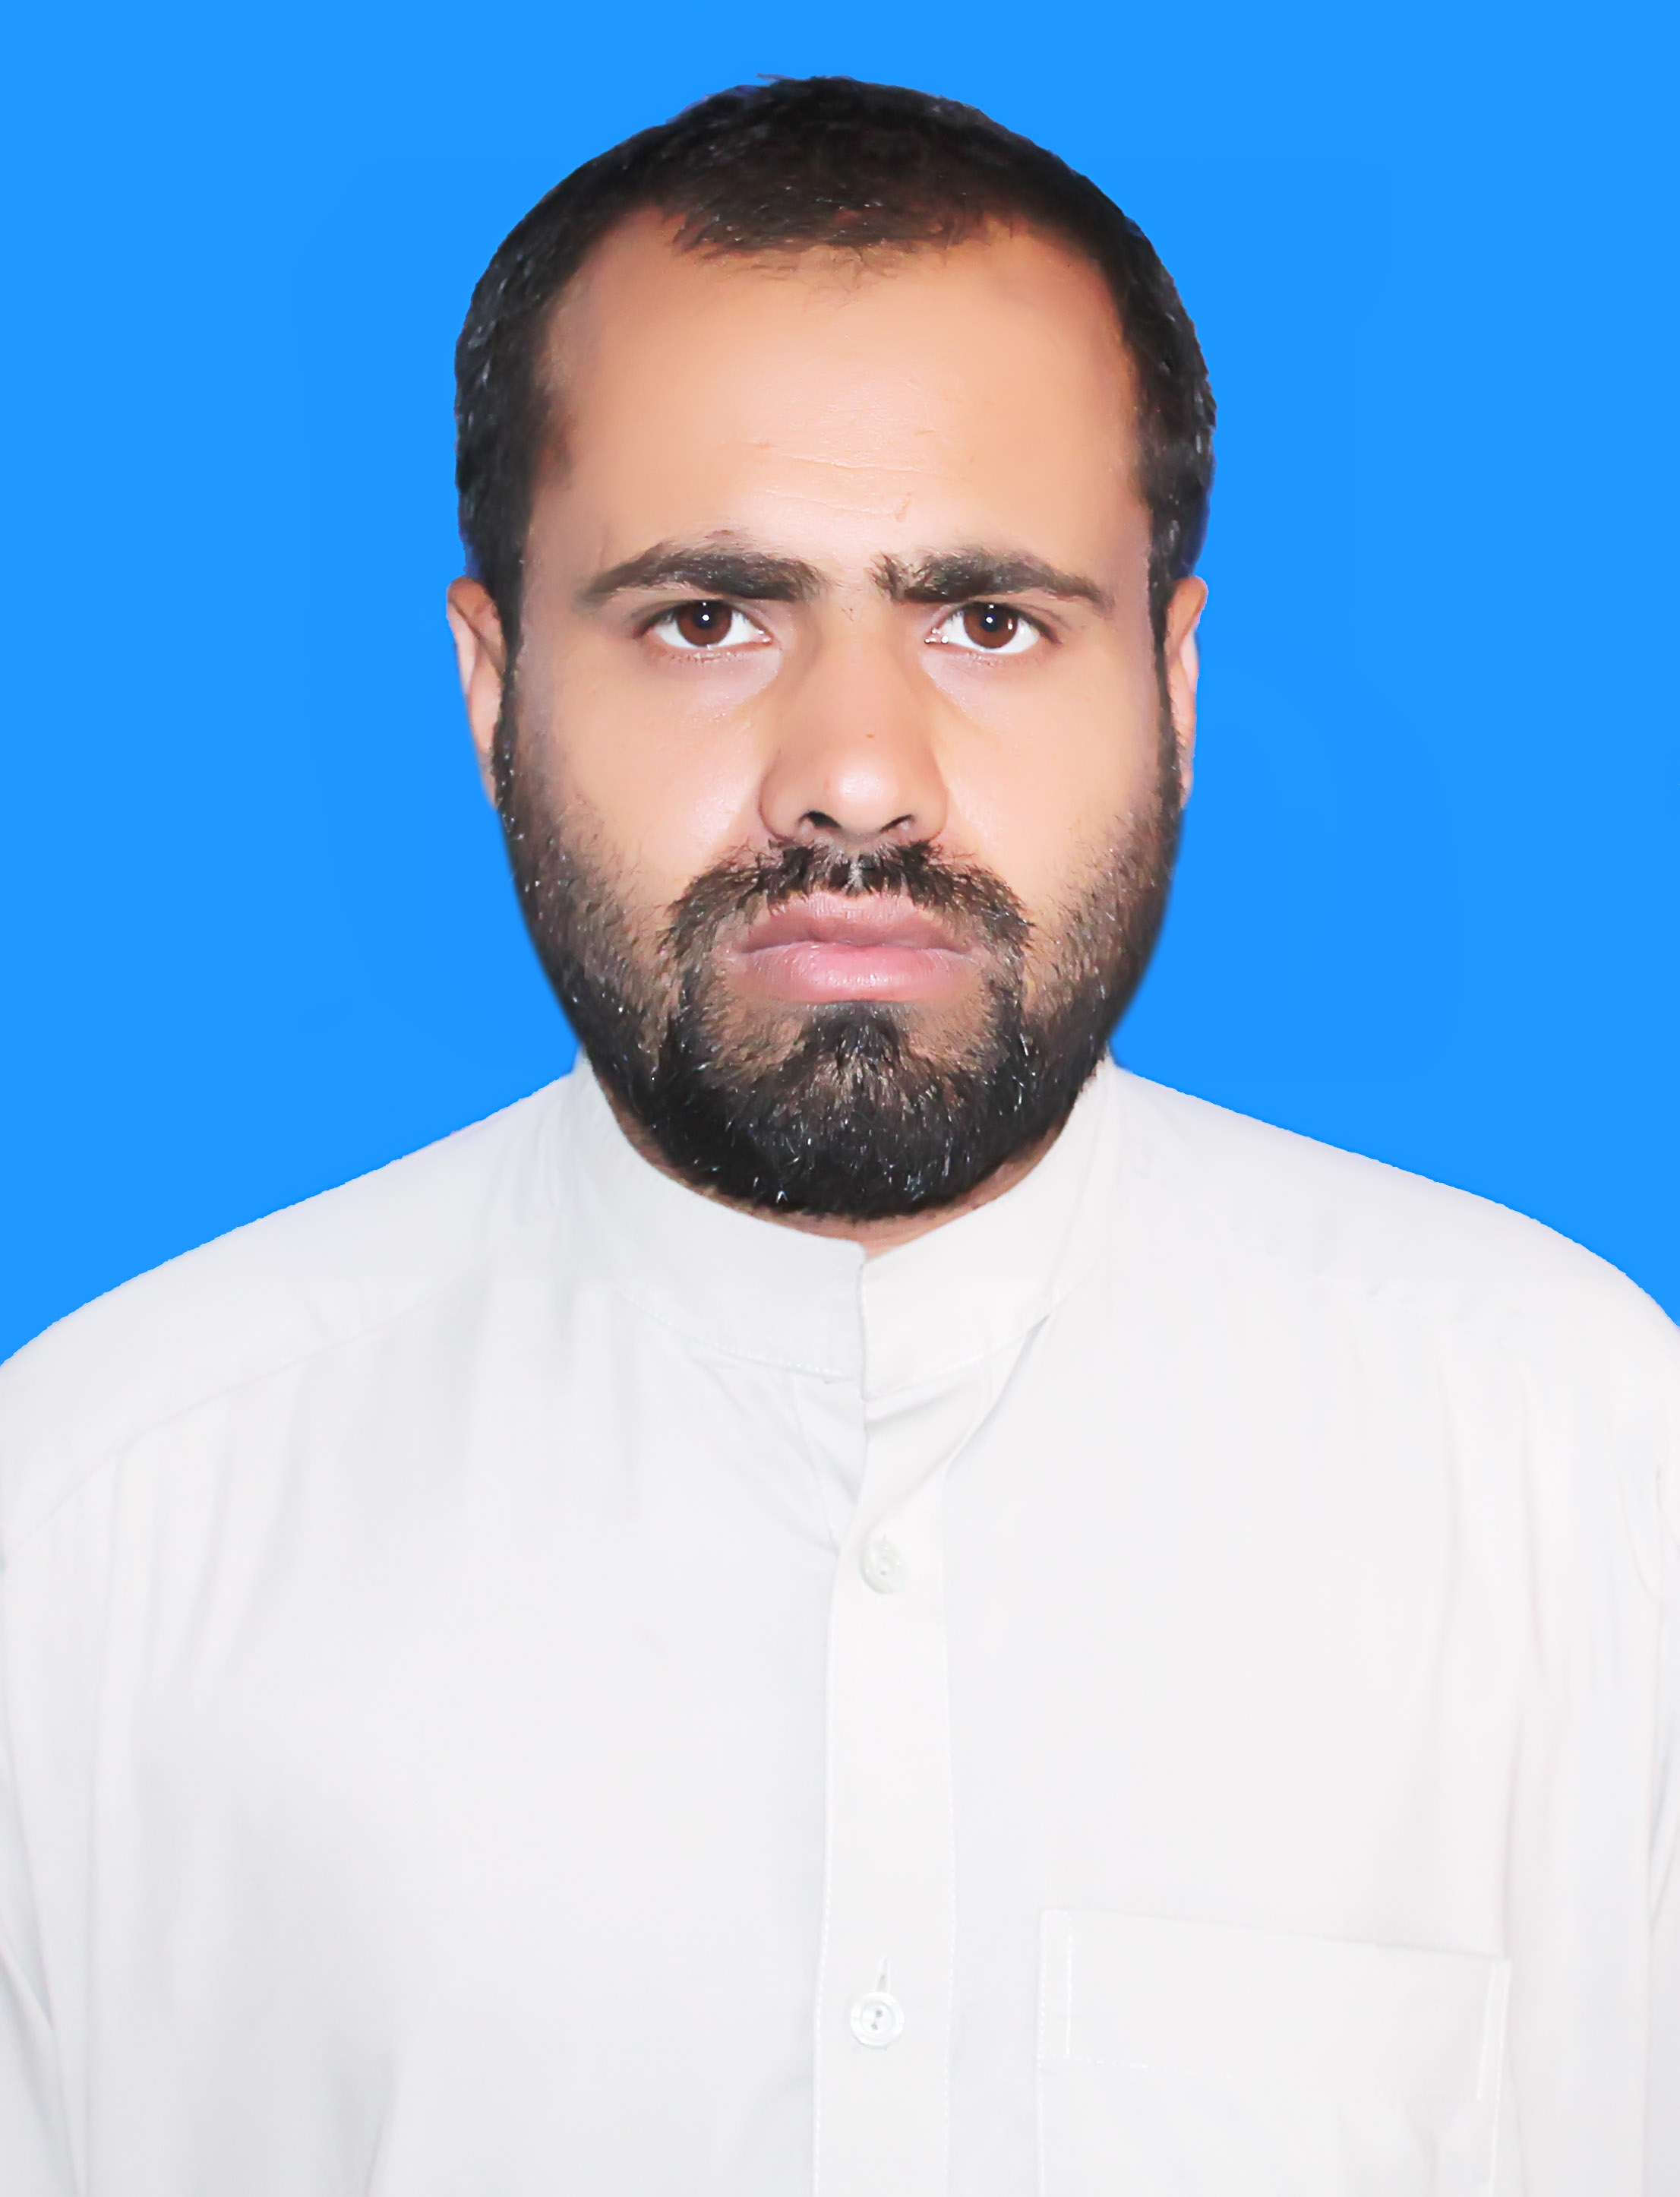 Fakhar Alam Word, Data Processing, Engineering, Electrical Engineering, Engineering Drawing